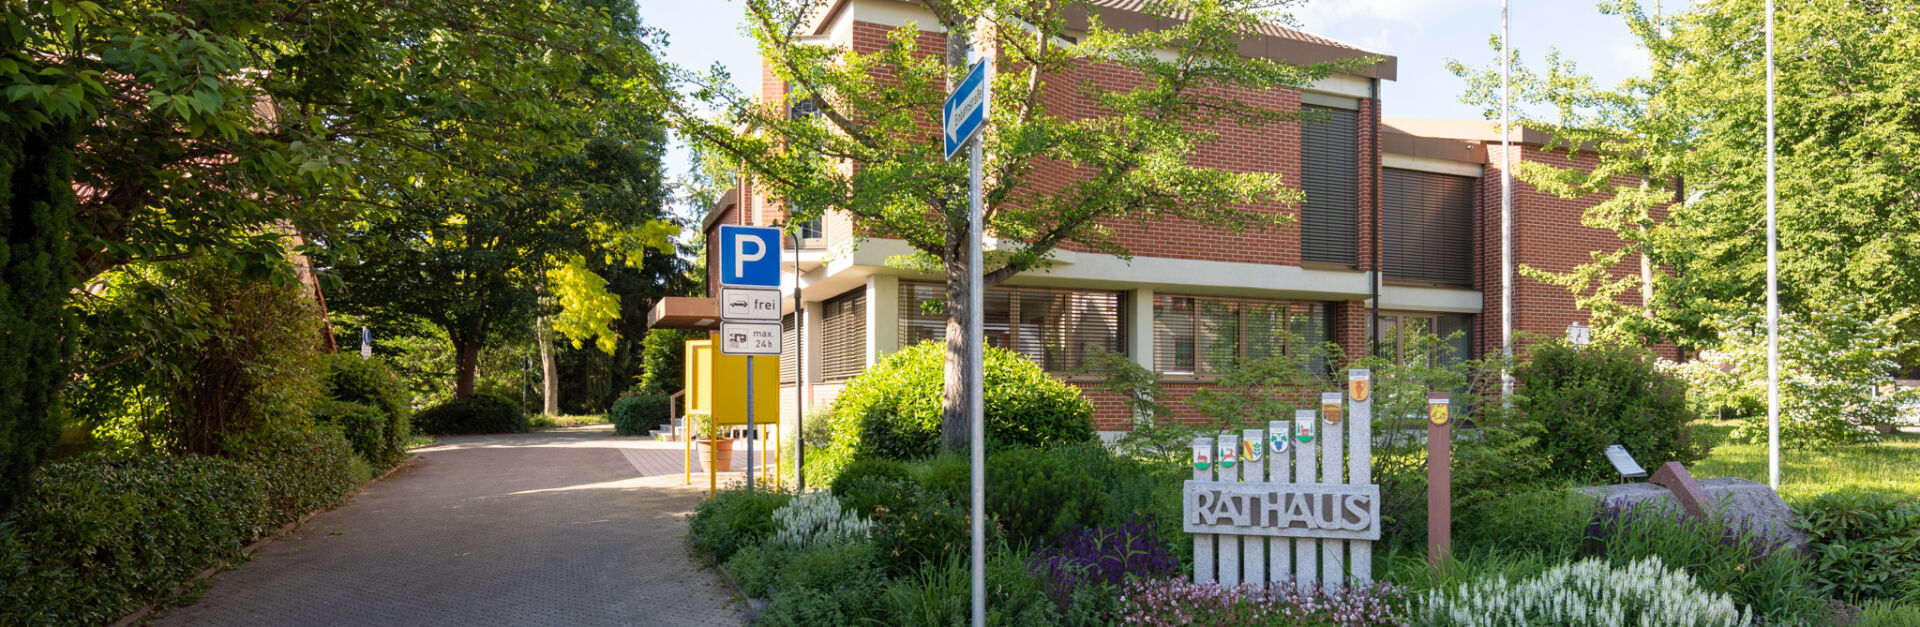 Rathaus Kandern